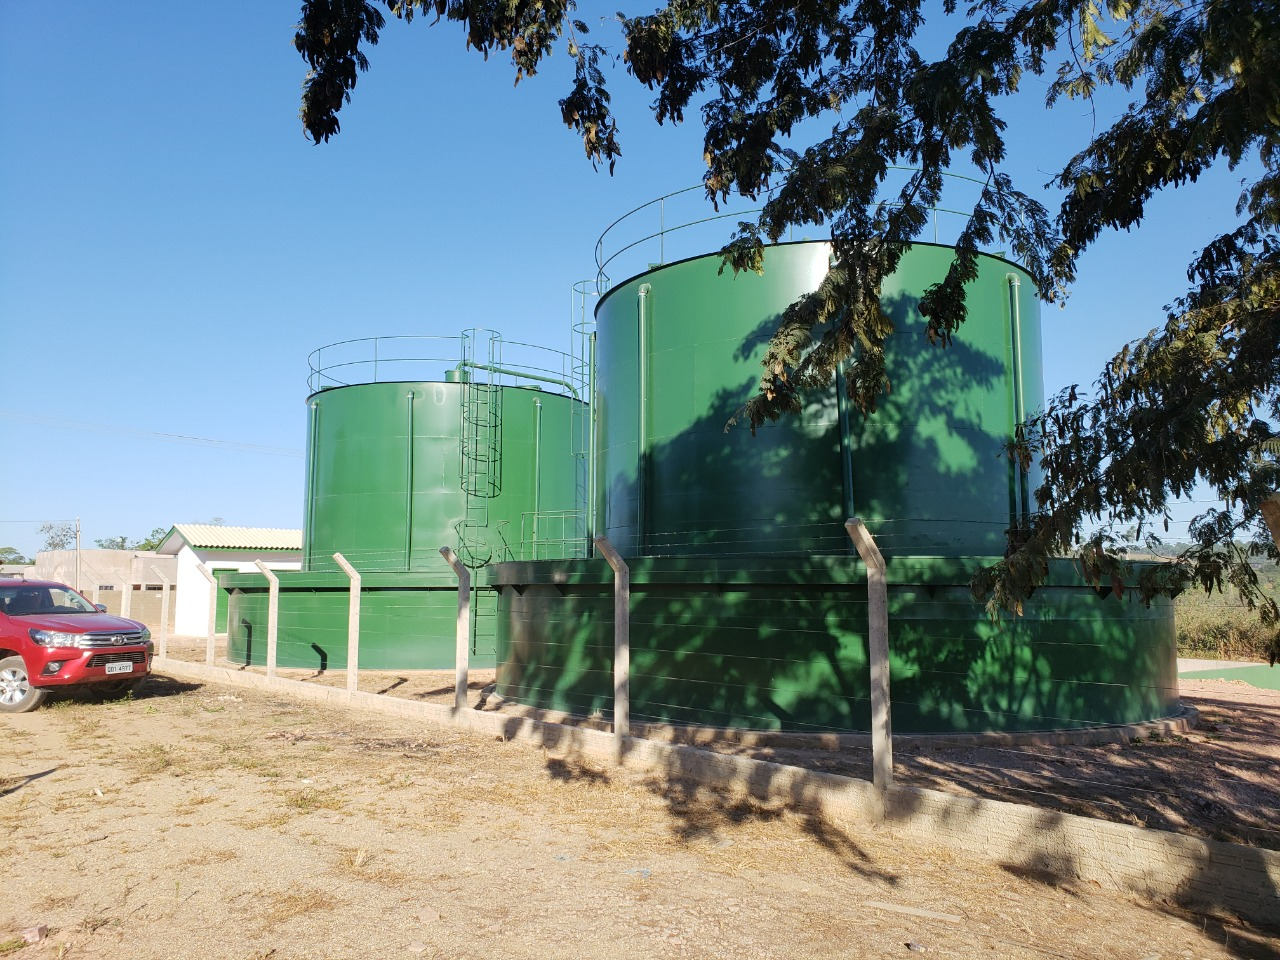 Saneamento: Priante consegue recursos para suprir falta de rede de água